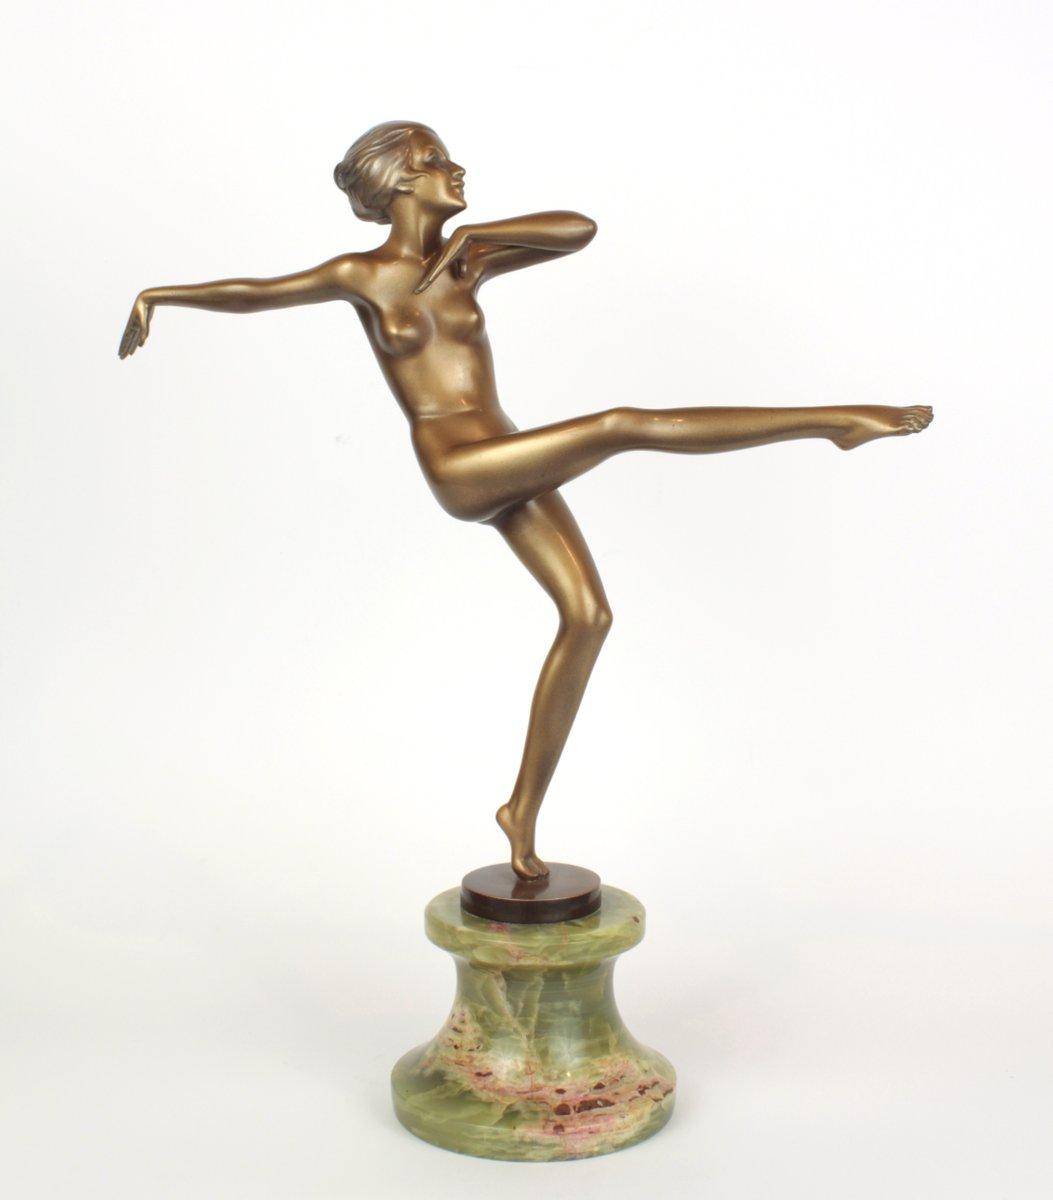 art deco bronze onyx sculpture by josef lorenzl 1930s for sale at pamono. Black Bedroom Furniture Sets. Home Design Ideas